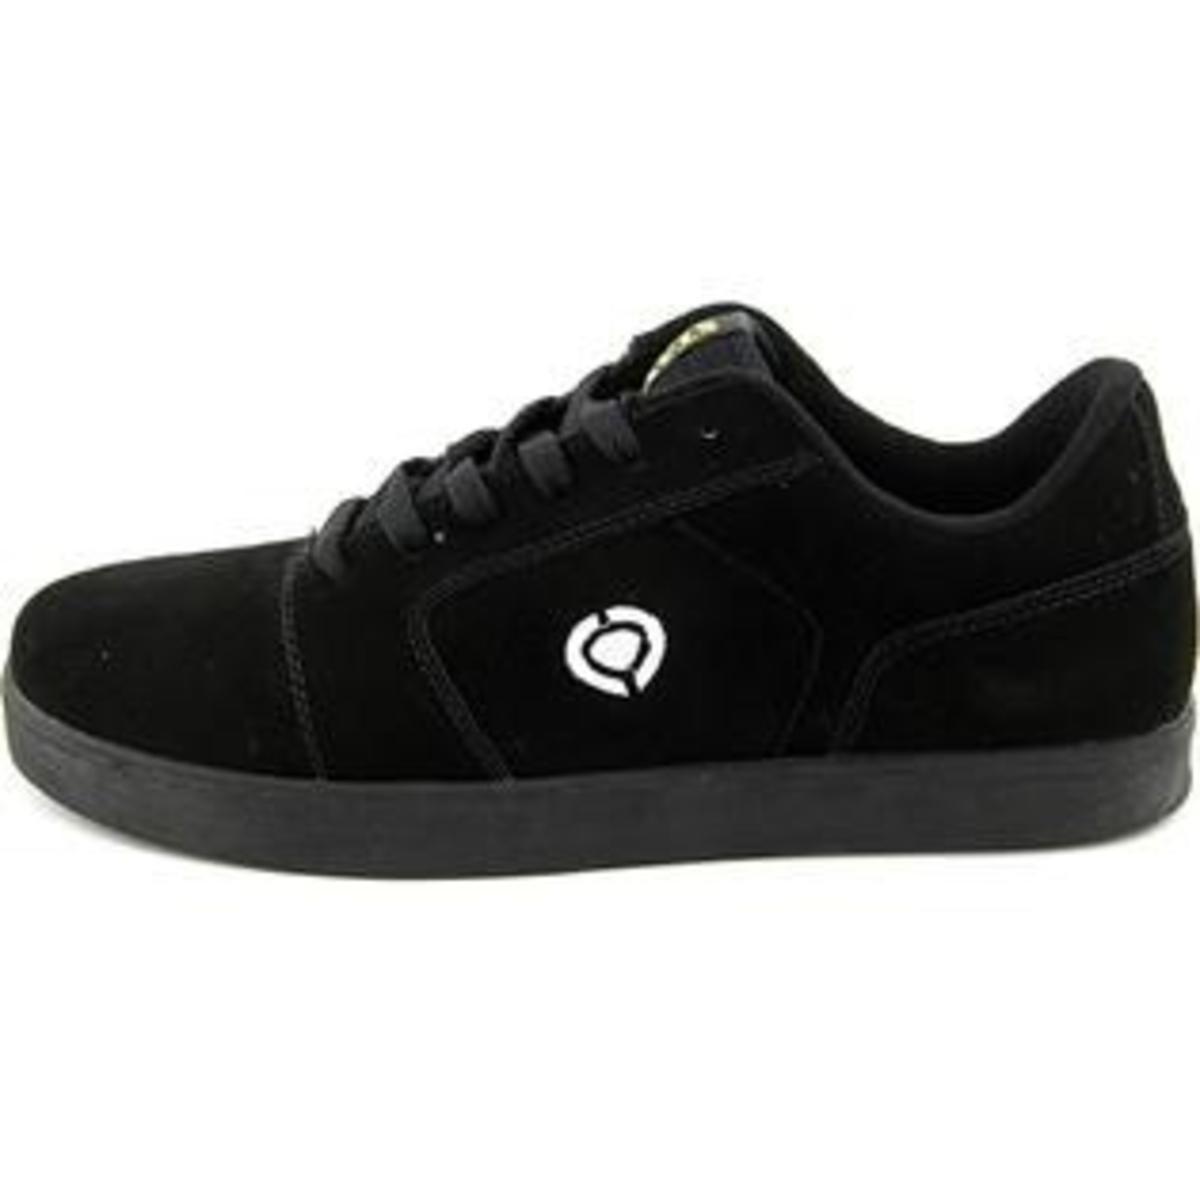 C1rca Skateboard Schuhe IV BWLC schwarz